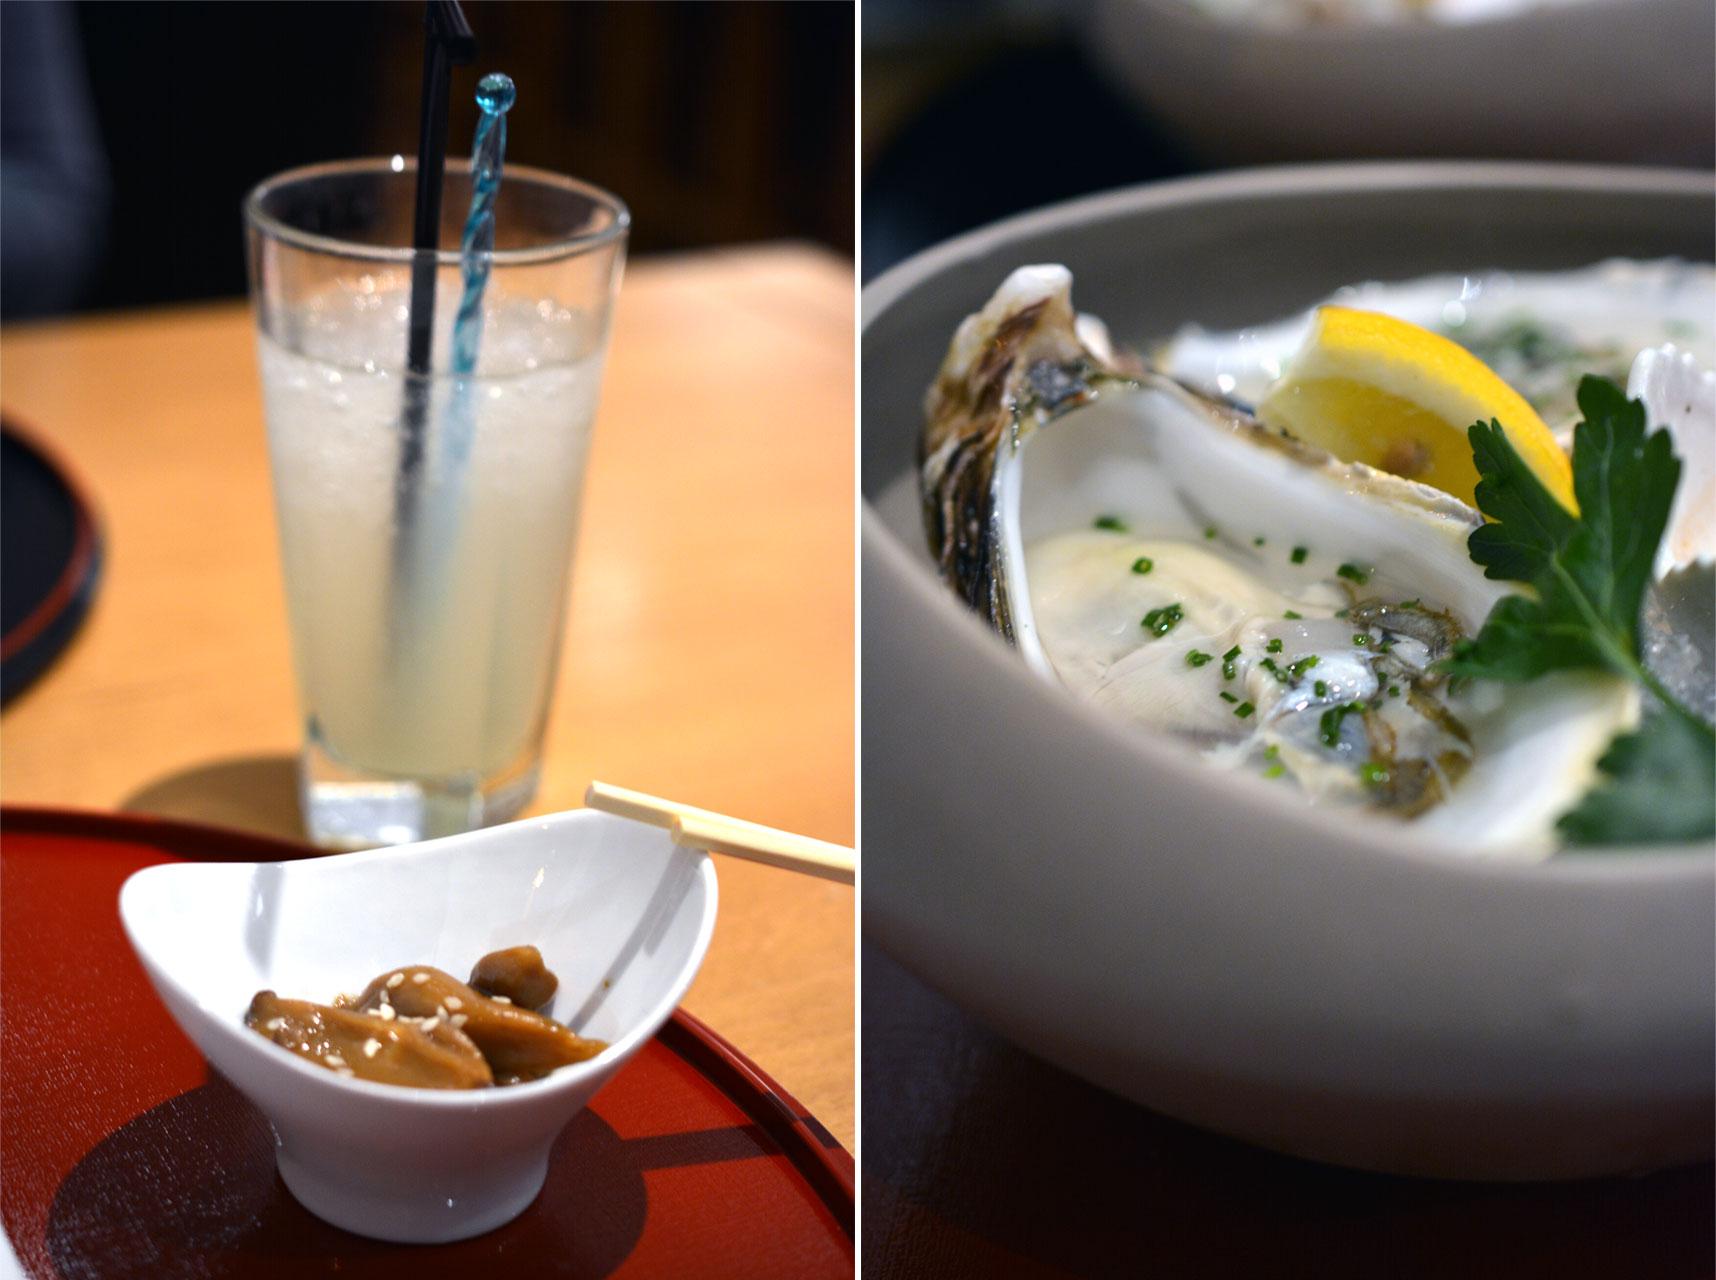 Gekochte Pilze mit Sesam, Yuzo Sour, Austern